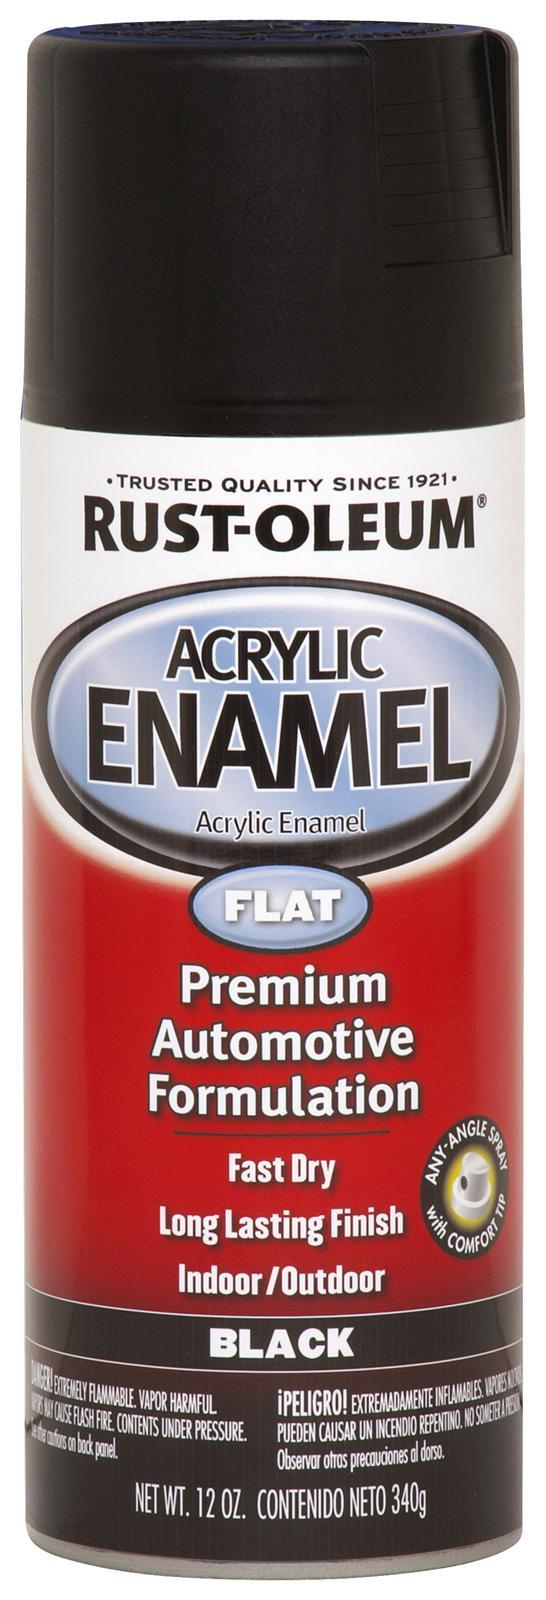 rust oleum paint acrylic enamel flat black aerosol 12 oz ea 248647. Black Bedroom Furniture Sets. Home Design Ideas